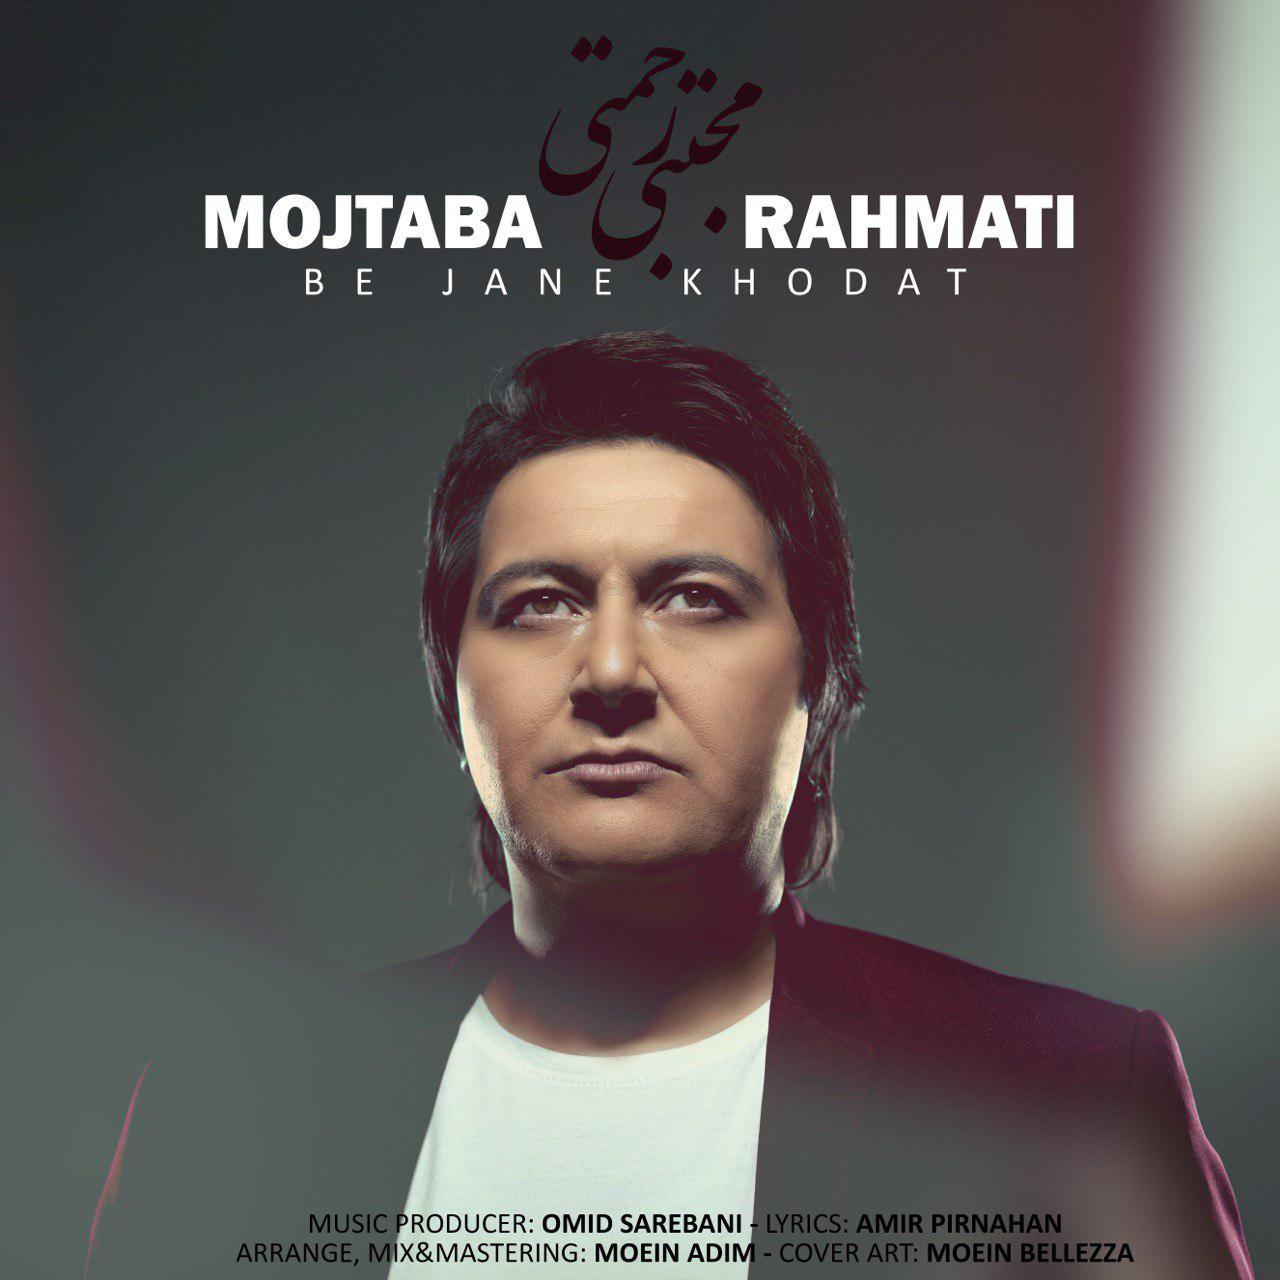 Mojtaba Rahmati – Be Jane Khodat